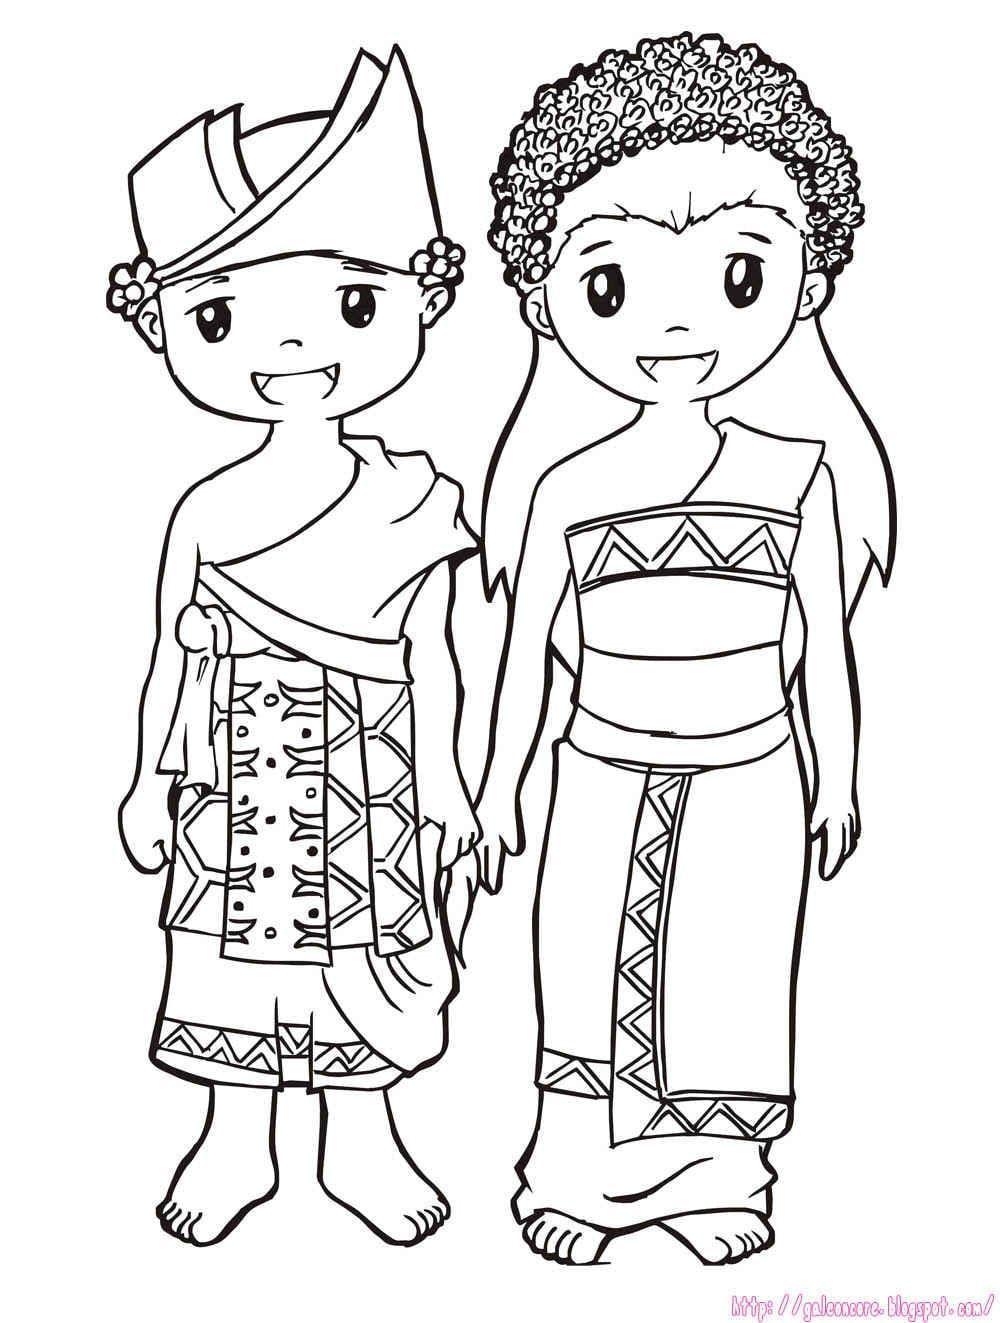 Gambar Animasi Pakaian Adat Jawa